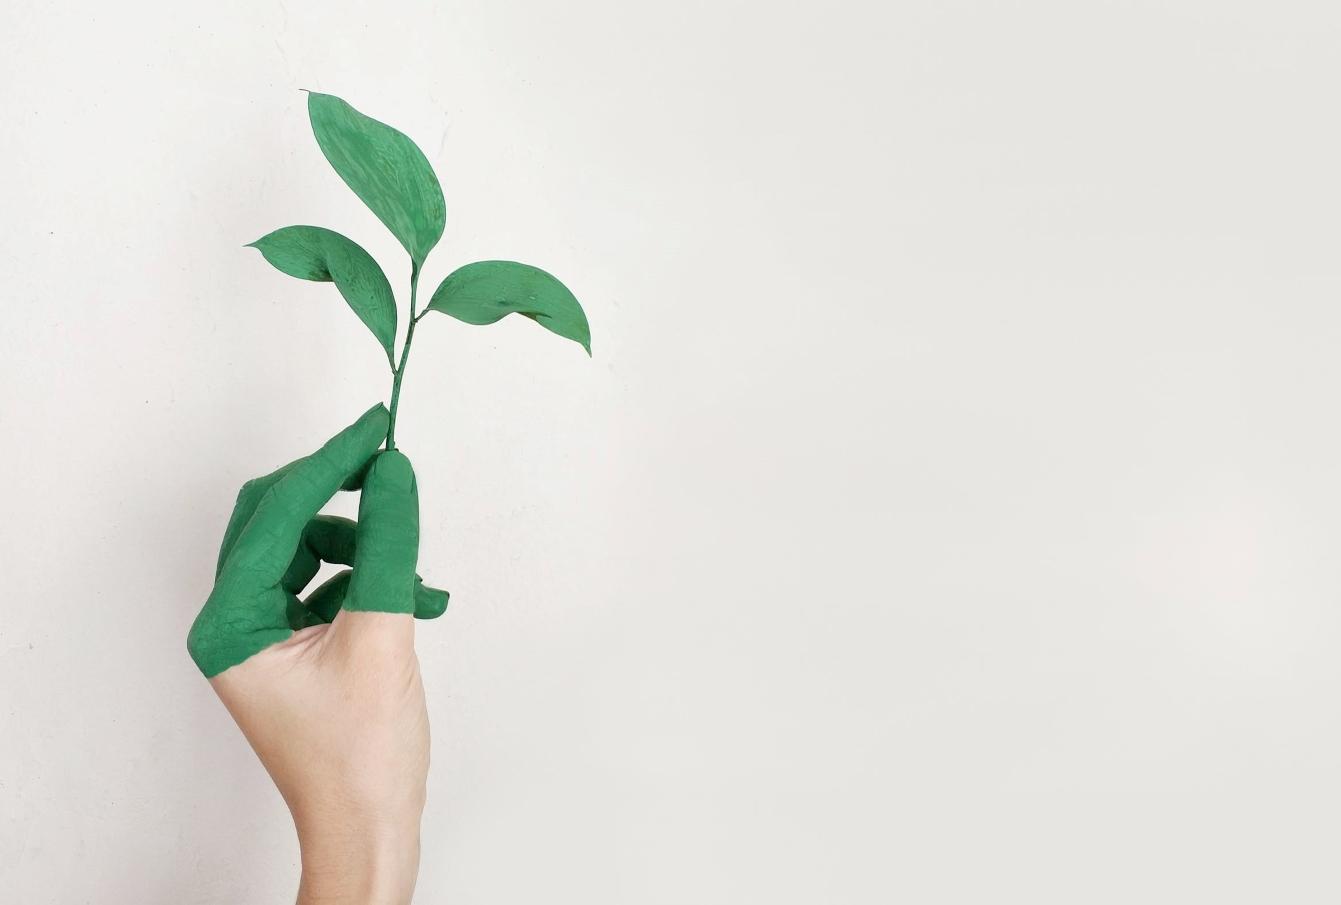 leadership in circular economy